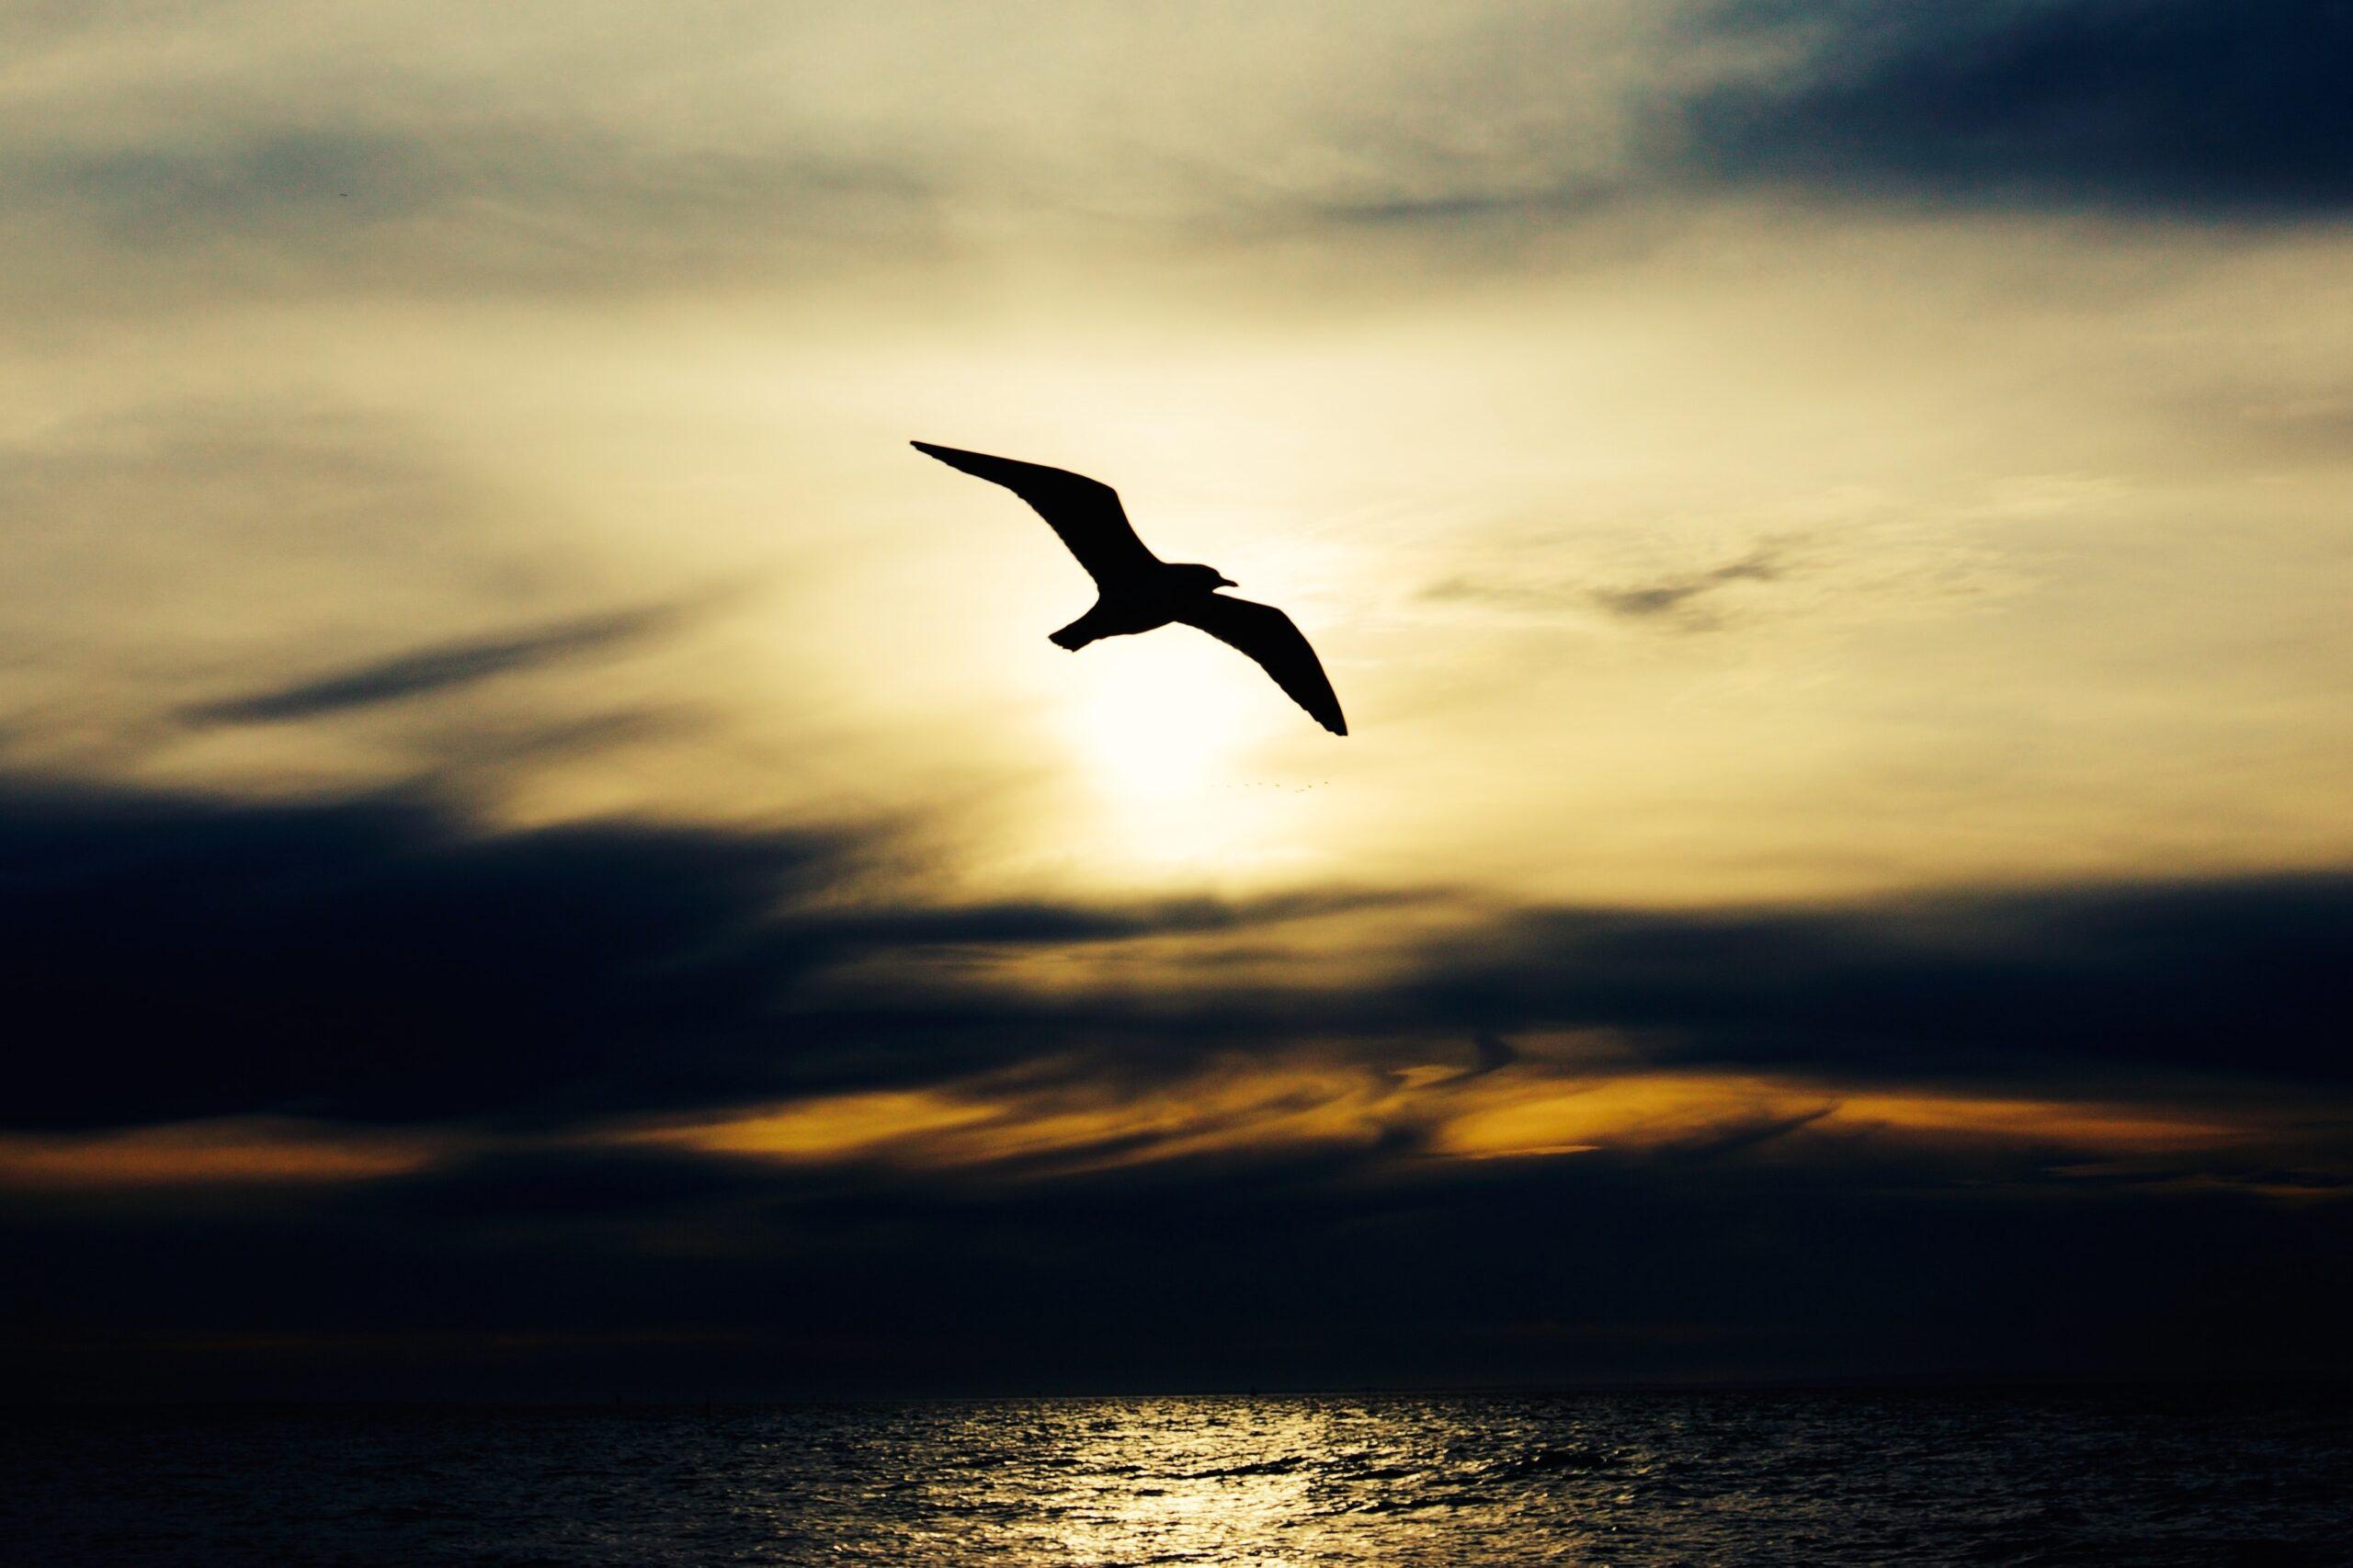 silhouette of bird in flight